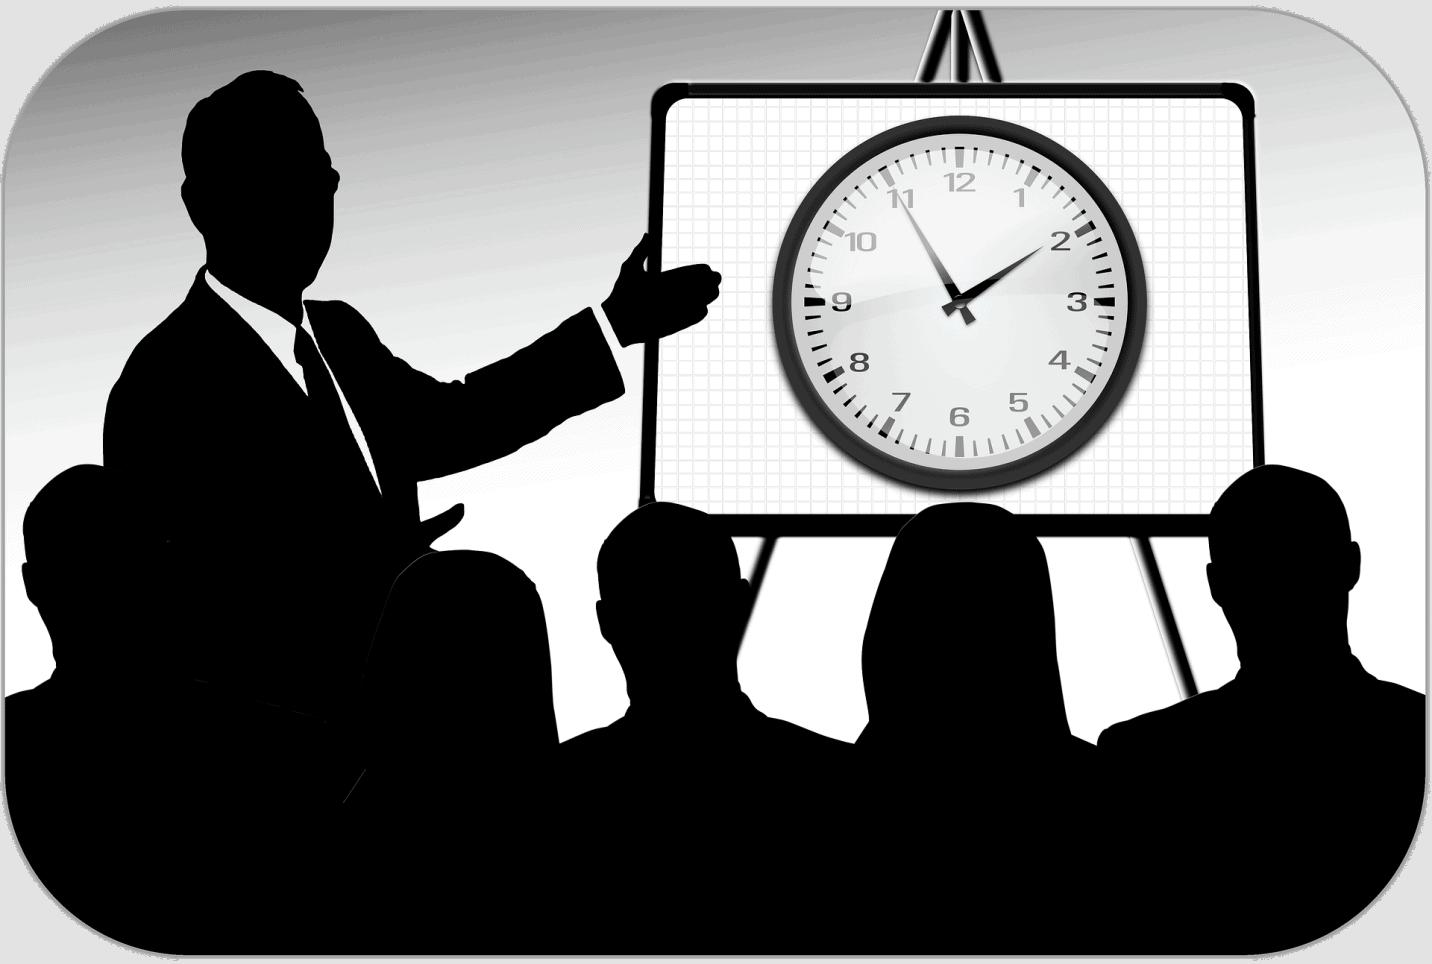 F:\Sohel\Brett\timogix.com\Jyoti written articles\images\Improves time management skills.png